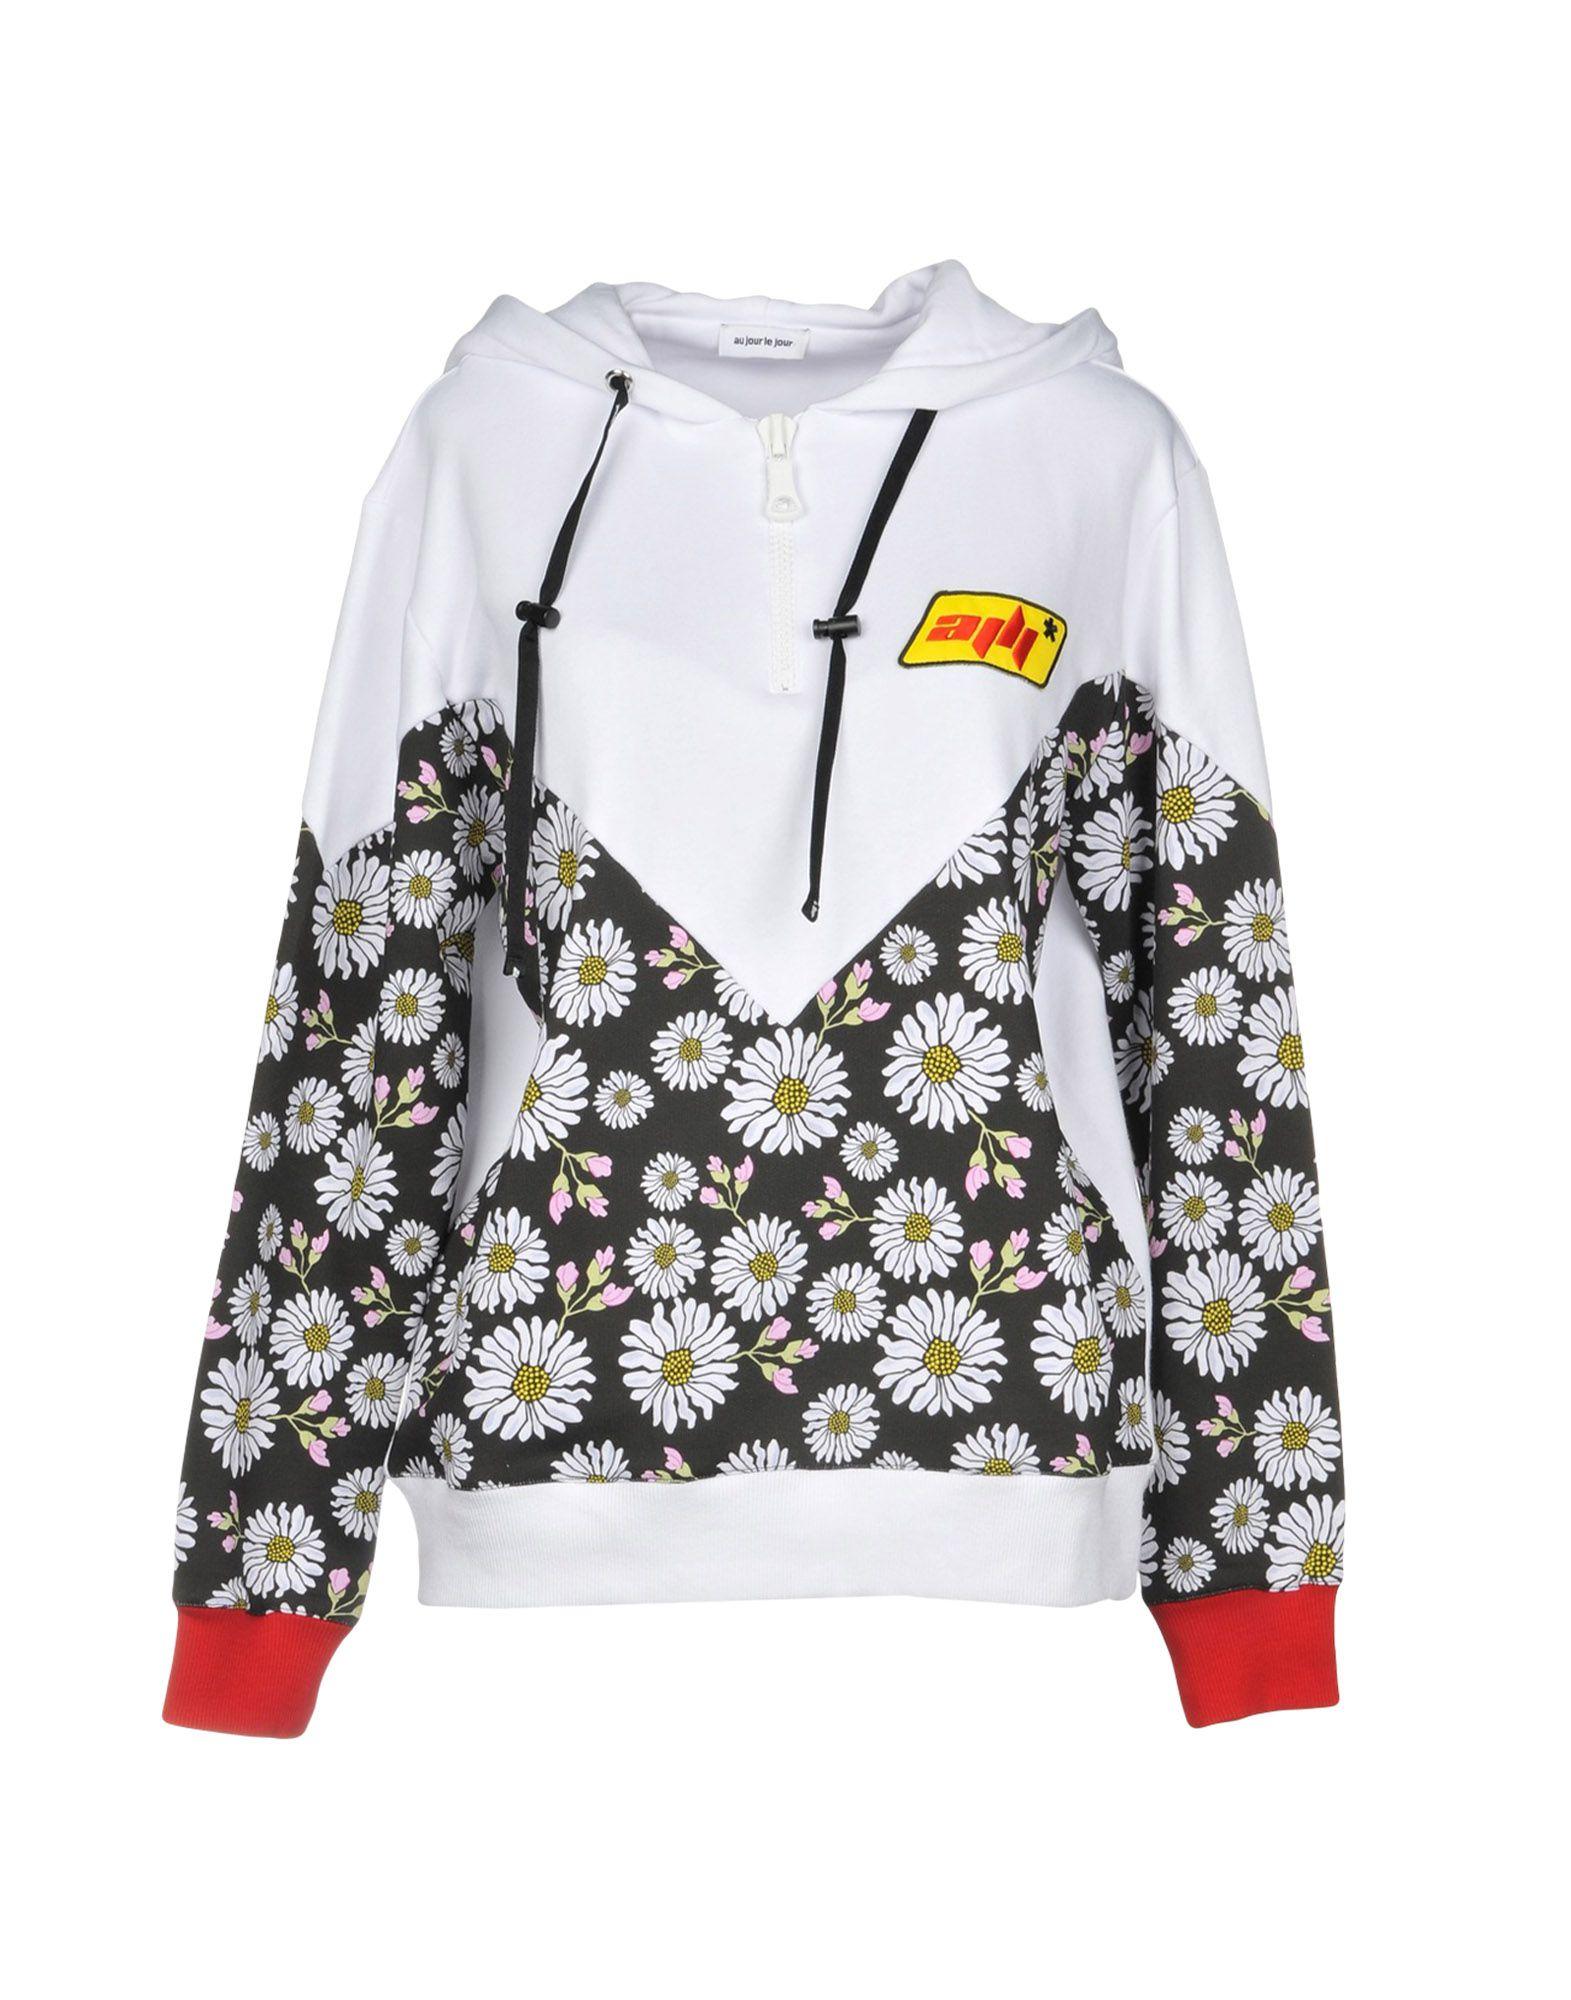 AU JOUR LE JOUR Hooded Sweatshirt in White